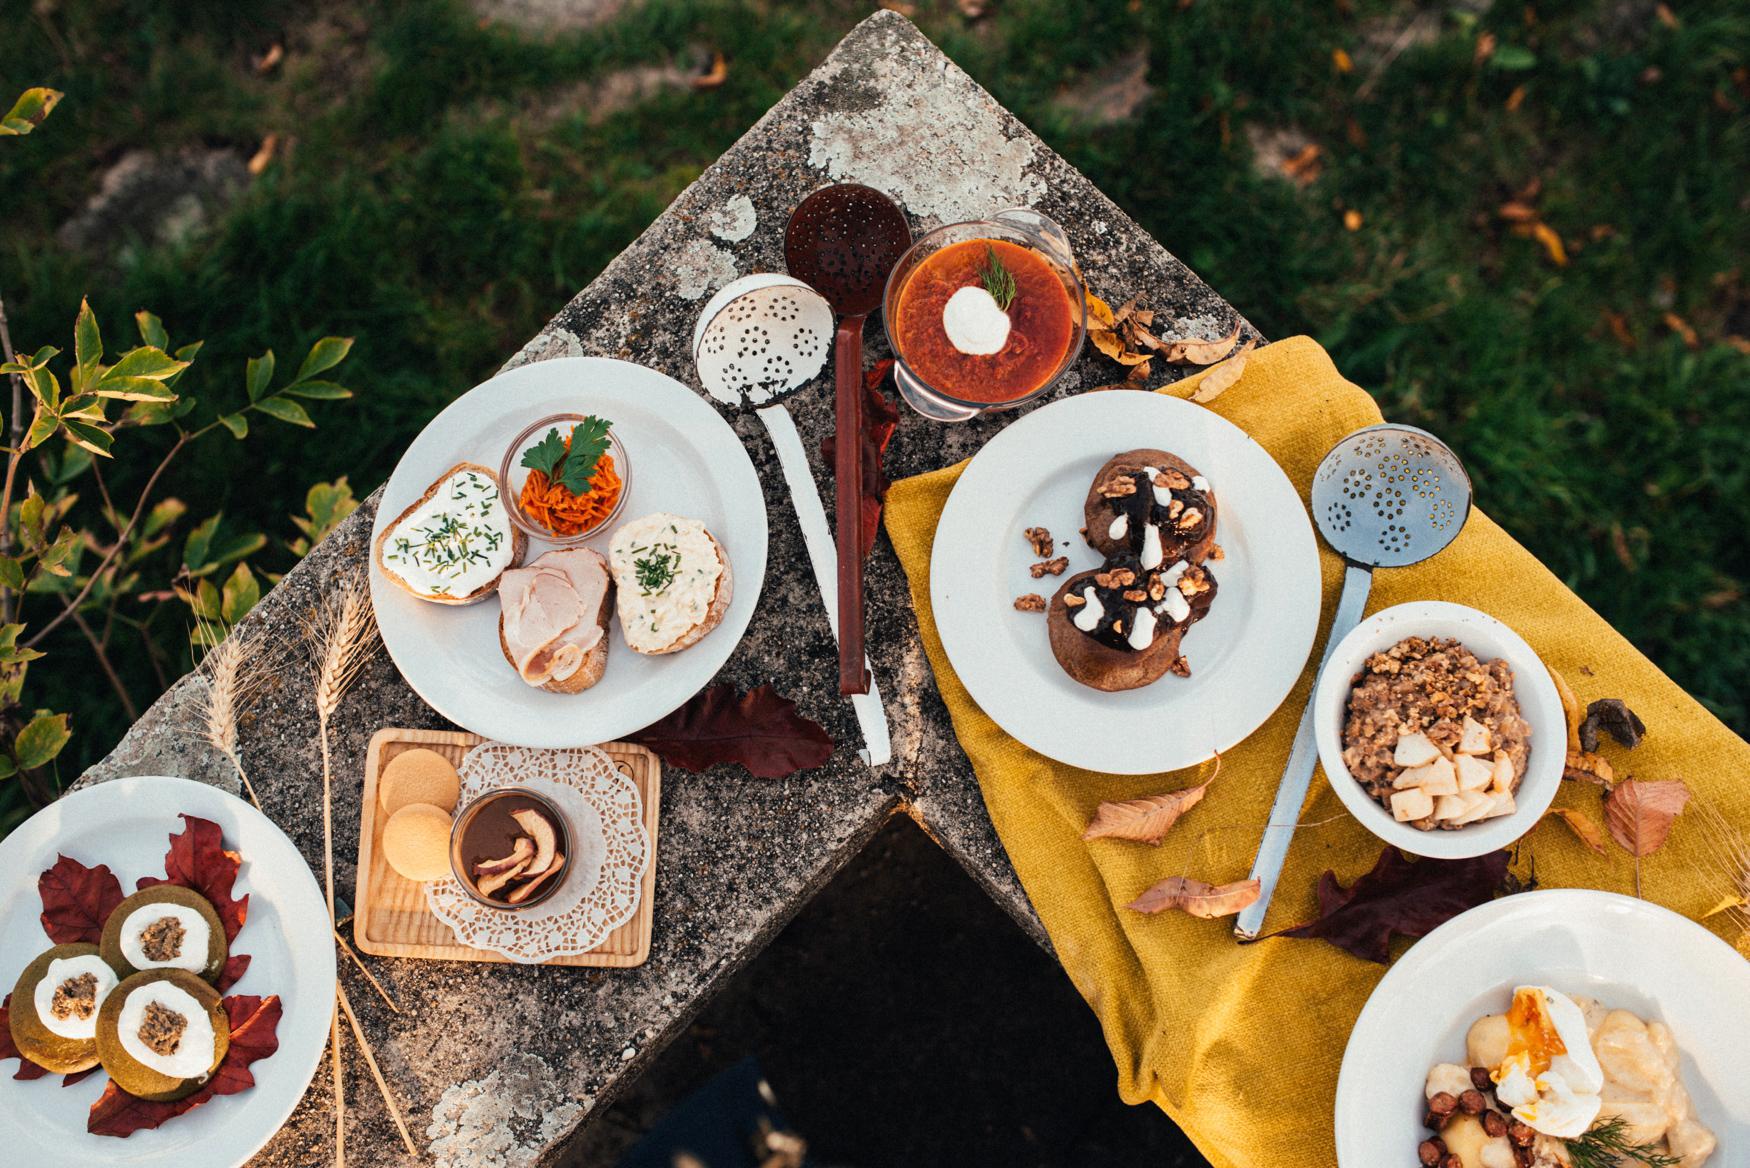 foodblog lifestyle photographer zufana 023.jpg